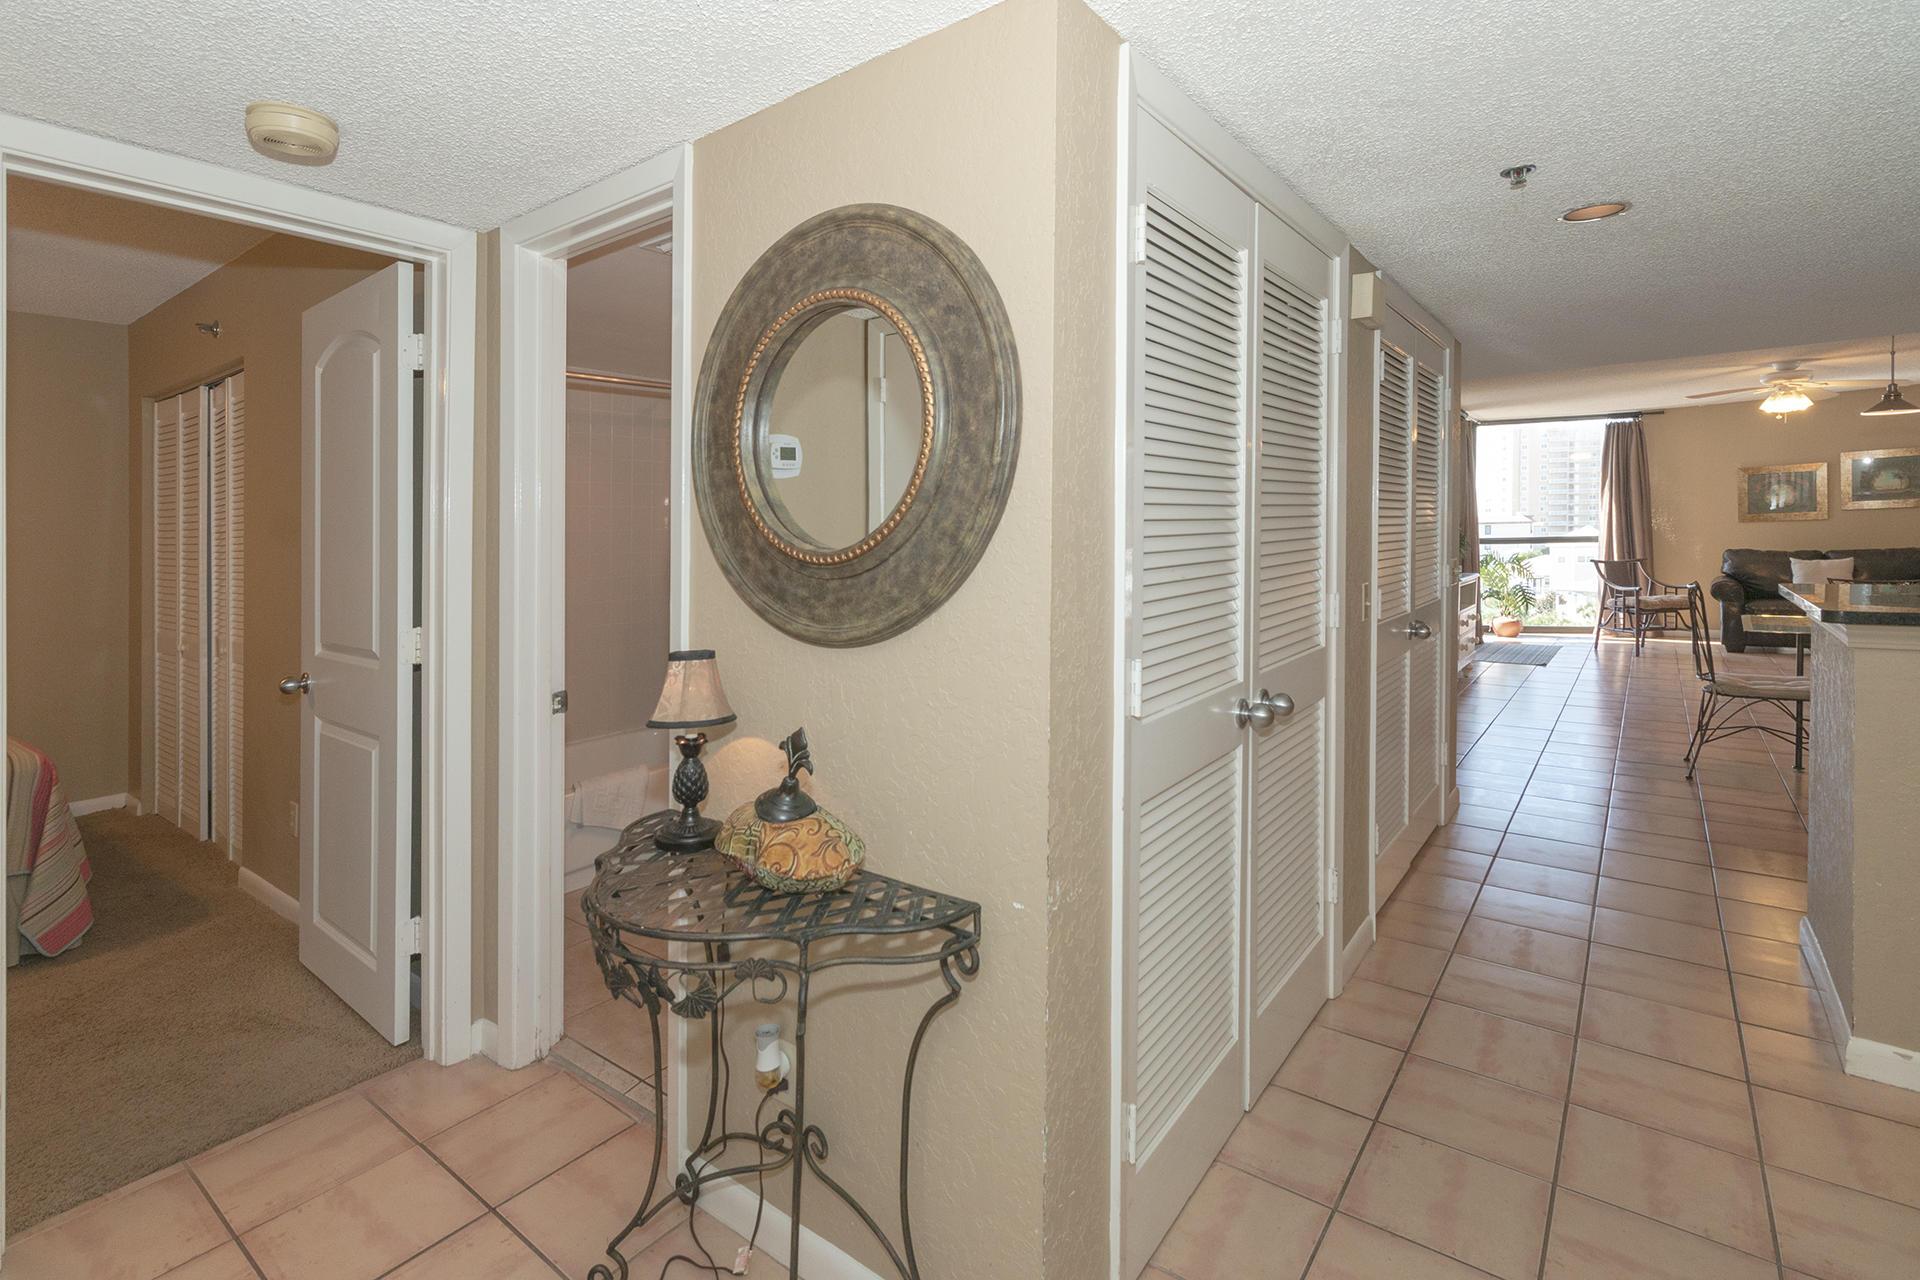 Miramar Beach Real Estate Listing, featured MLS property E809854